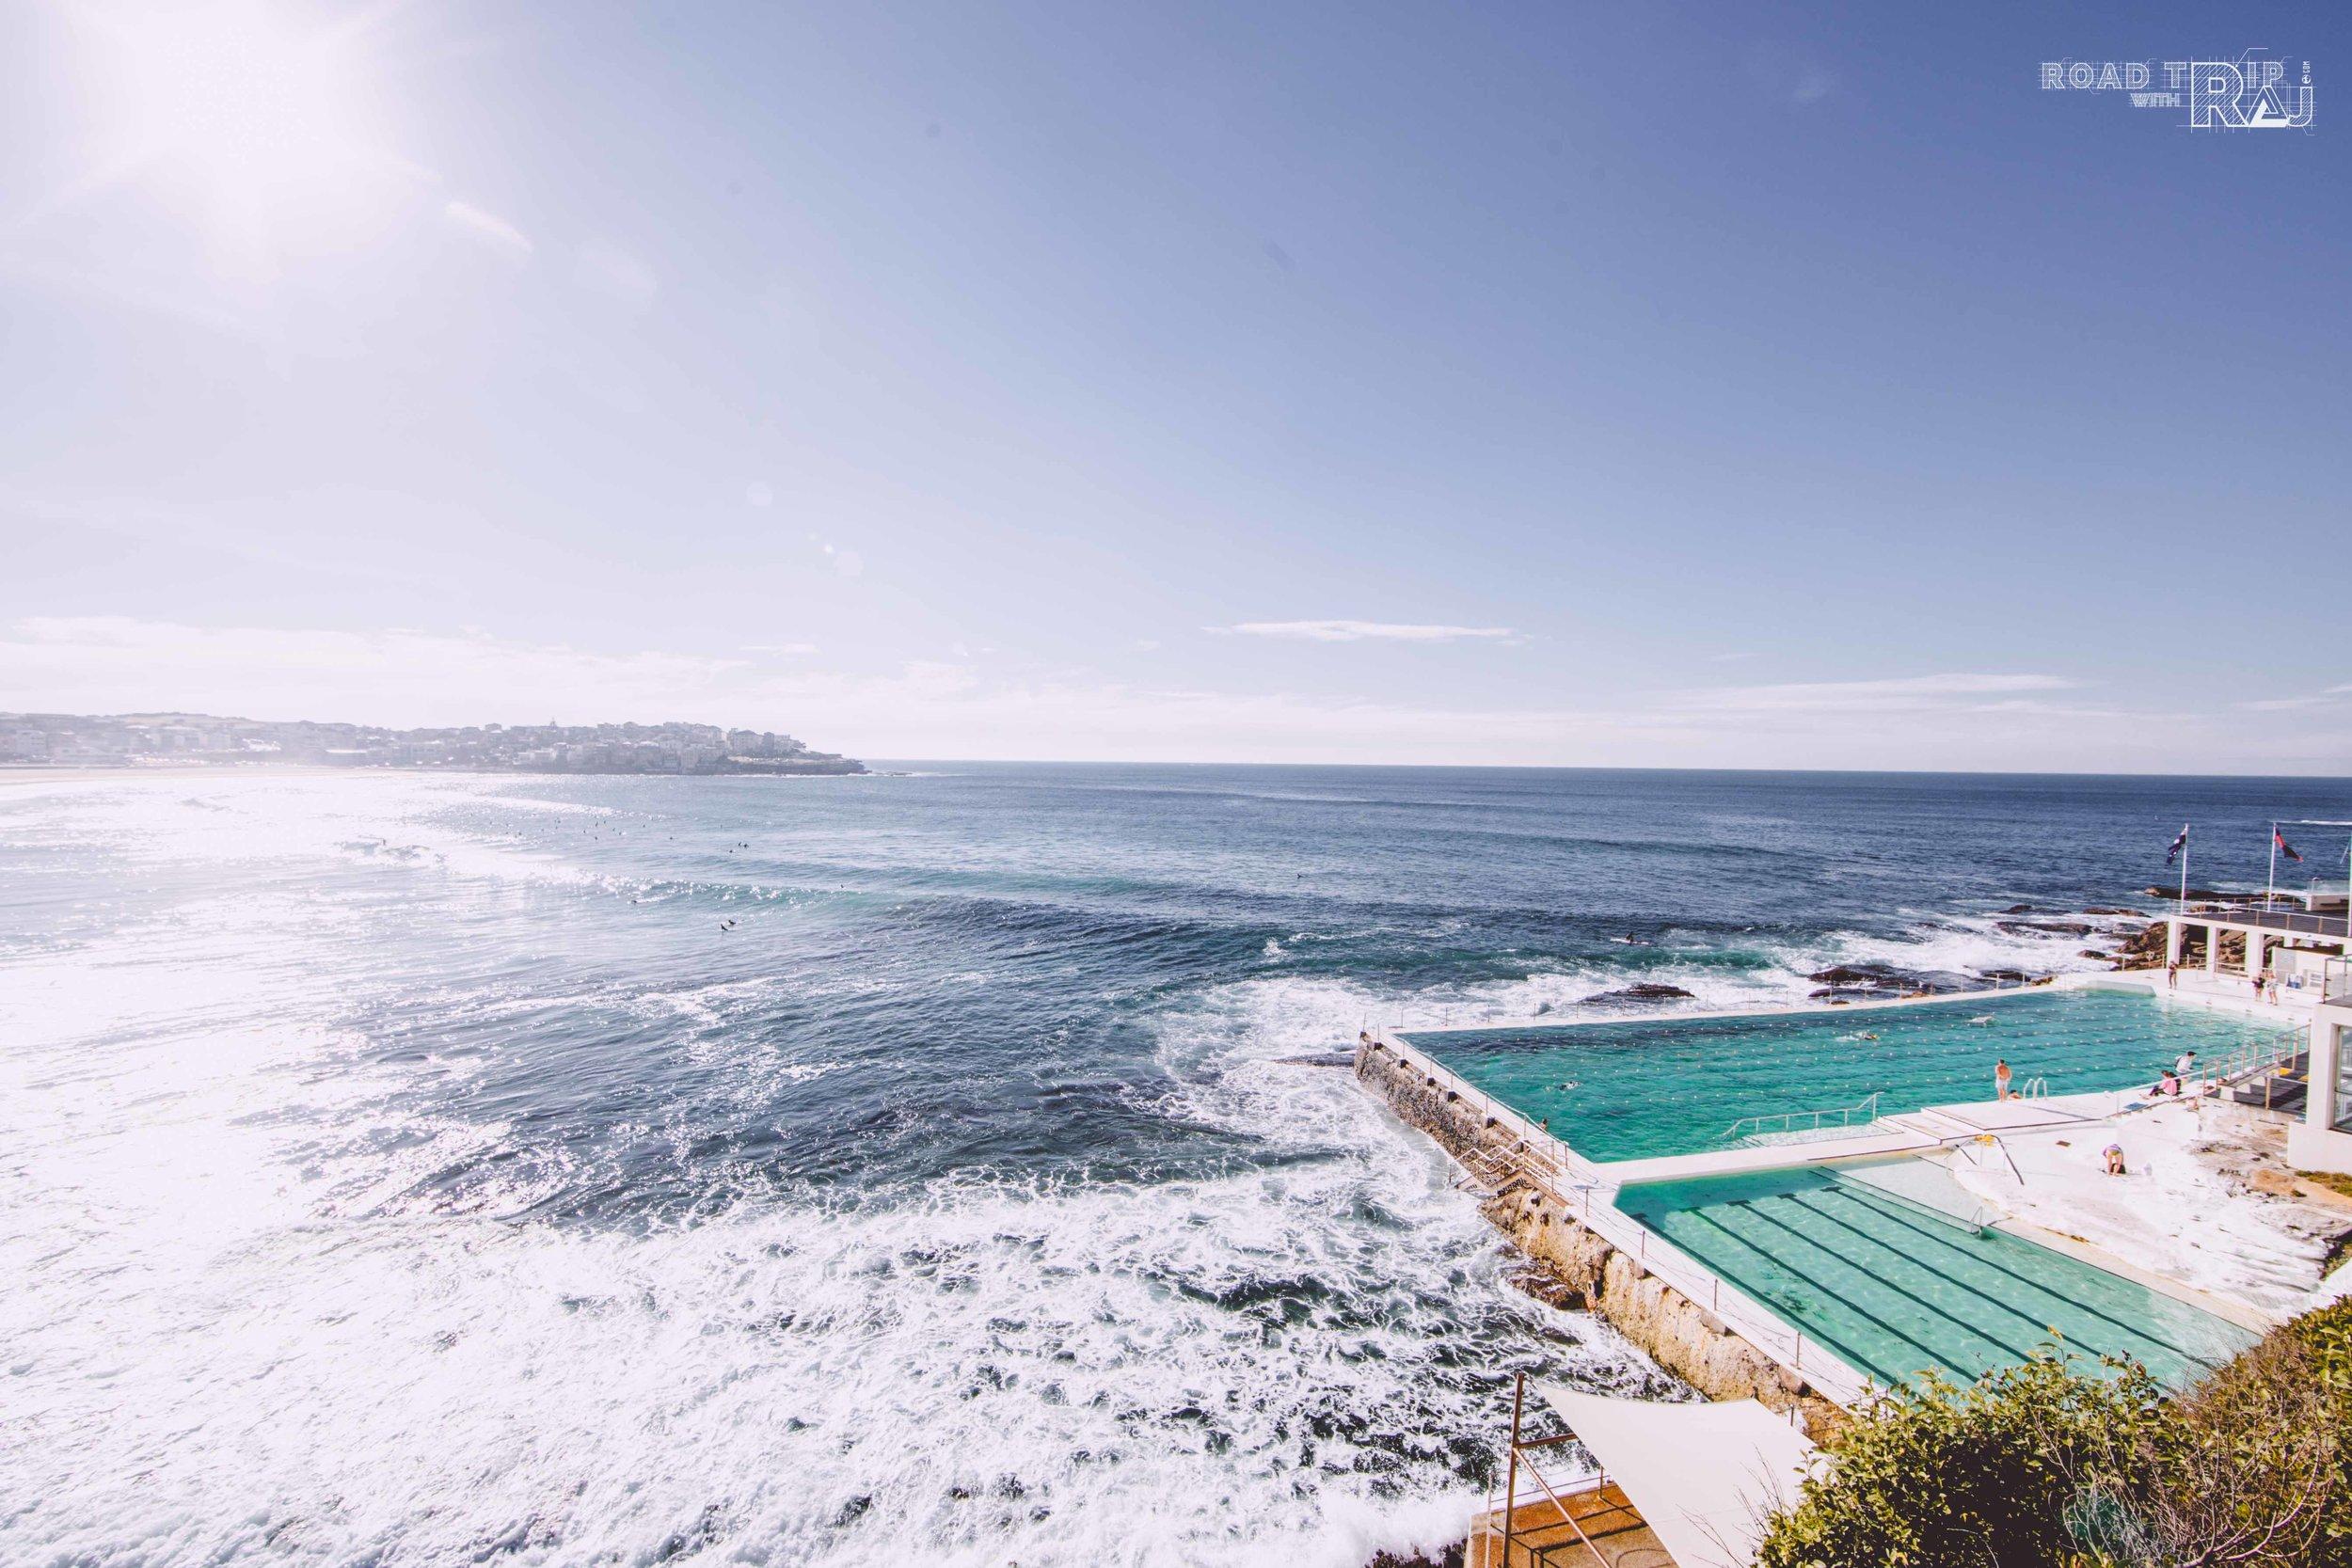 bondi-beach-amazing-place-in-sydney.jpg